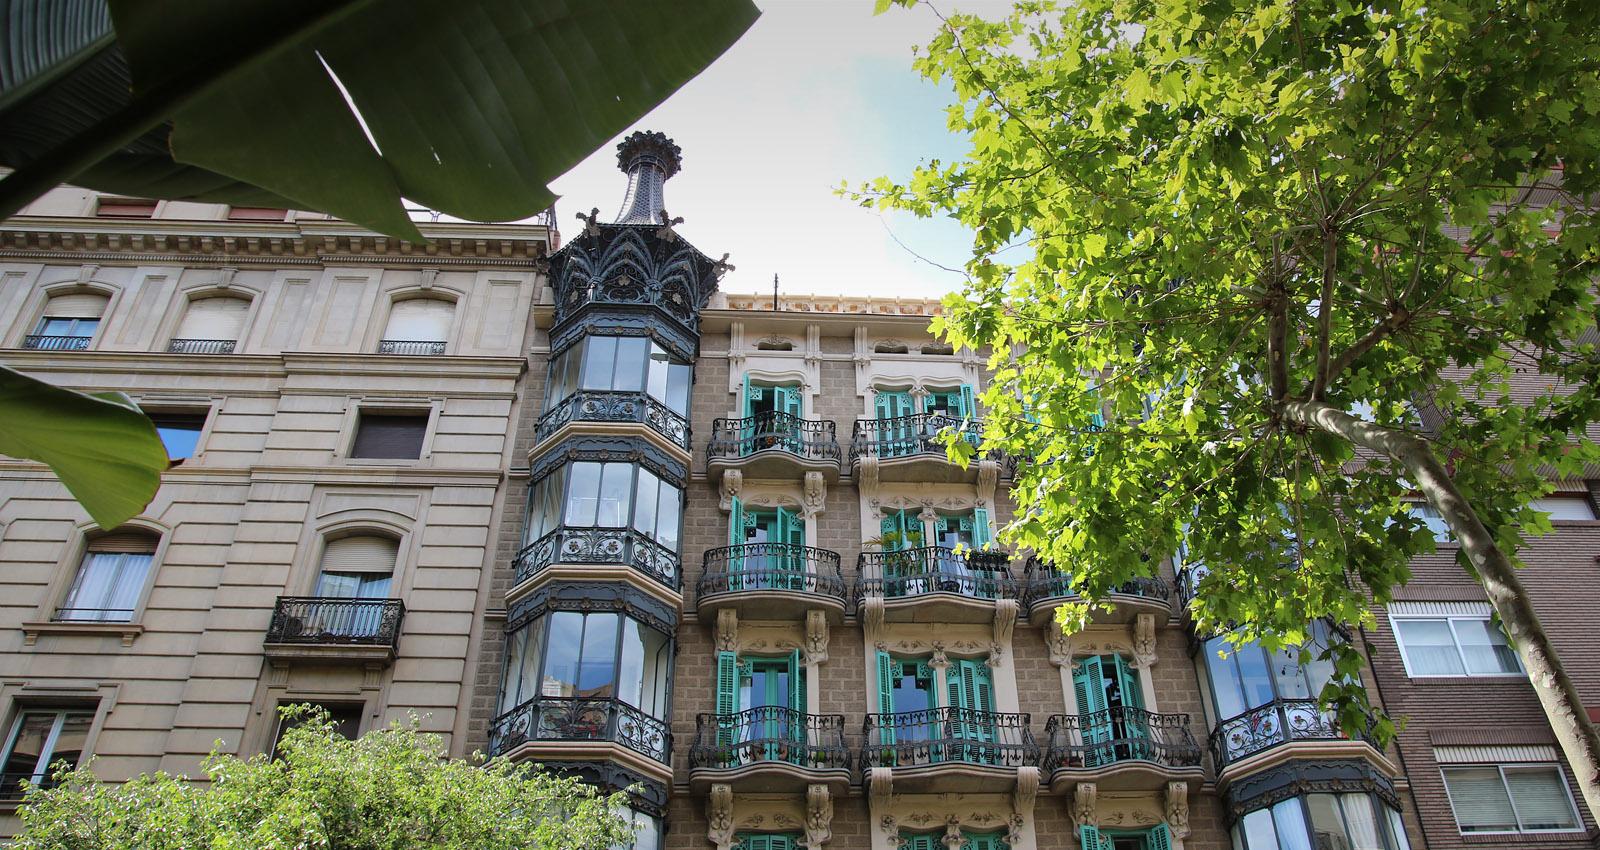 barcelona die 3 besten gegenden f r besucher favourhoods. Black Bedroom Furniture Sets. Home Design Ideas